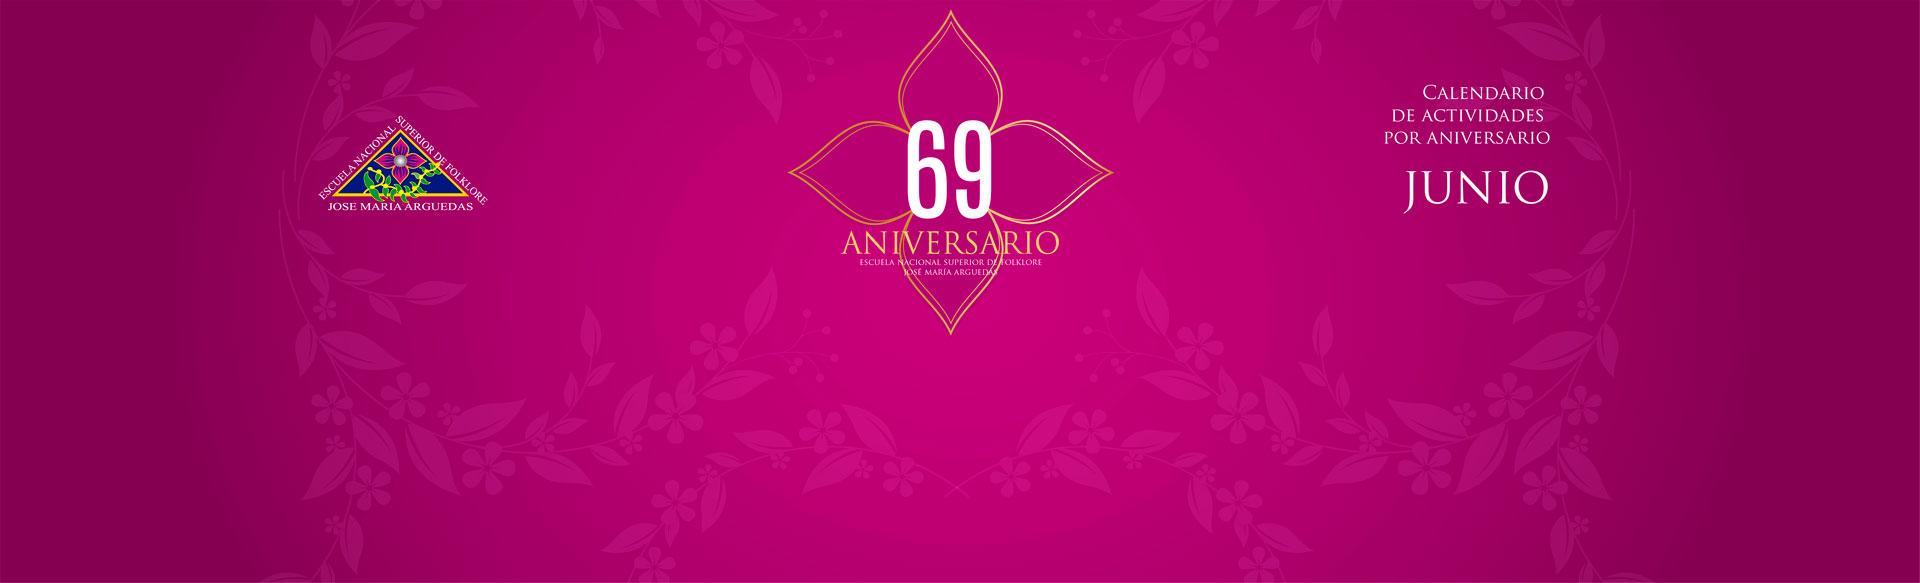 69aniversario